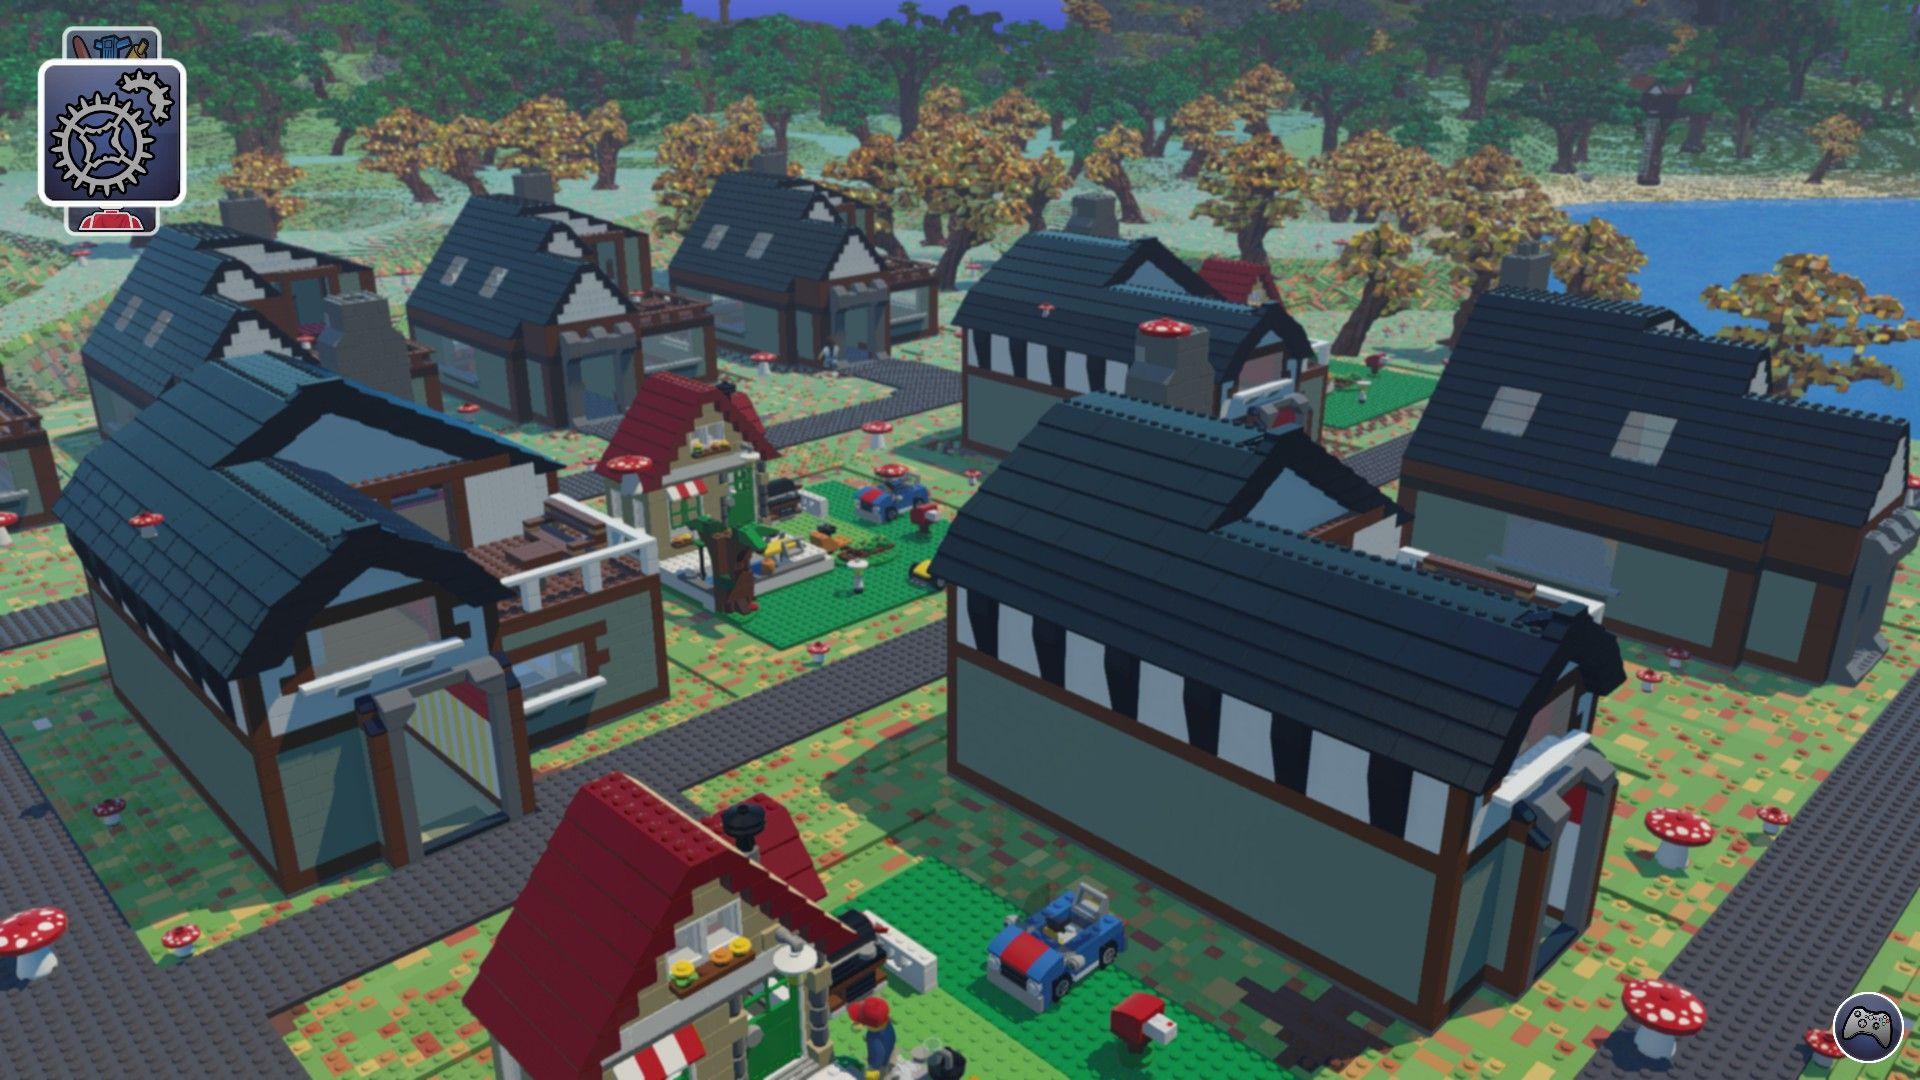 LEGO Worlds (Xbox One) - 4